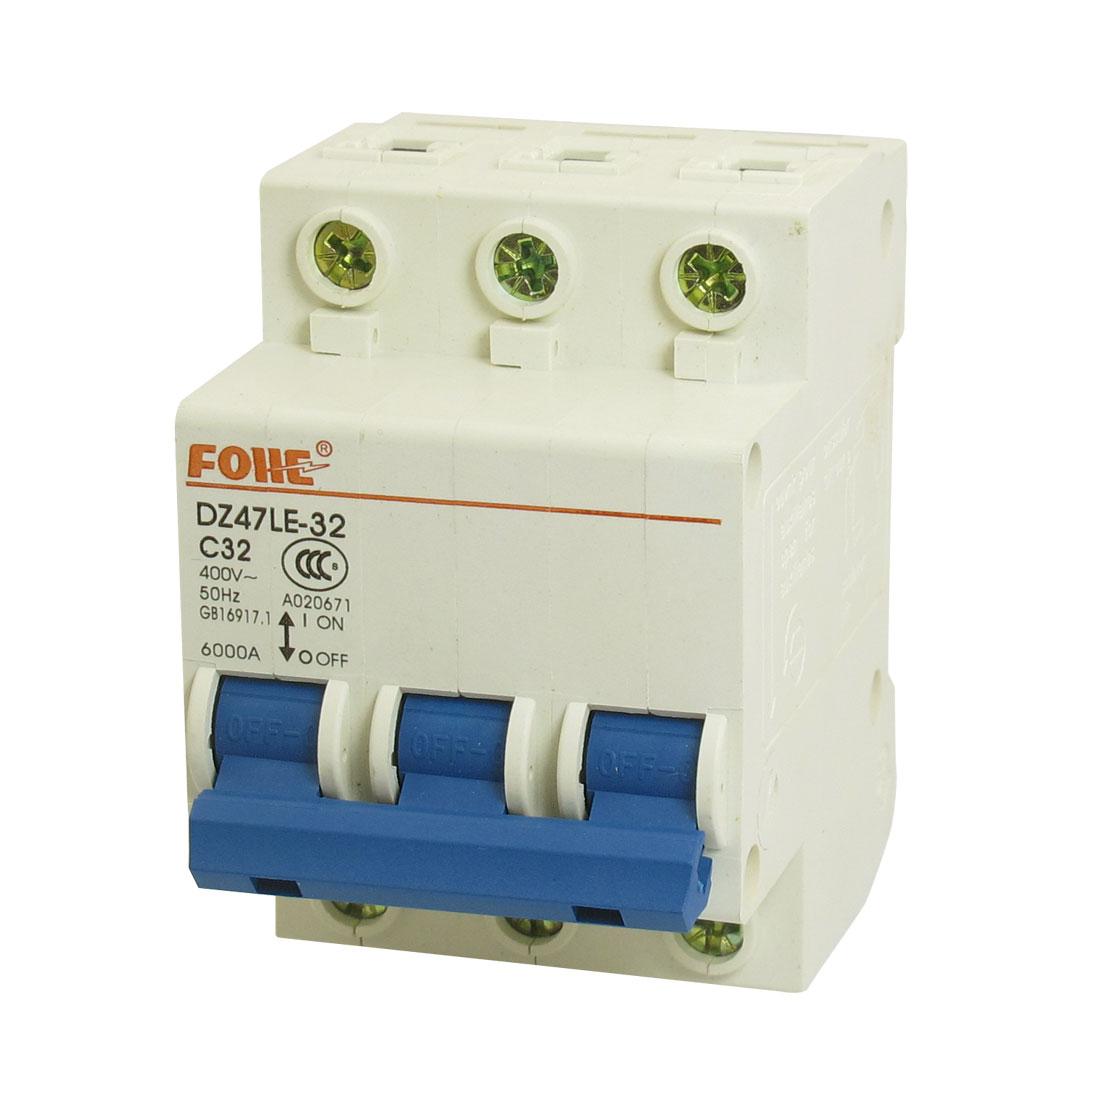 AC 400V 32A 6000A 3P 3 Pole Miniature Circuit Breaker DIN Rail DZ47LE-32 C32